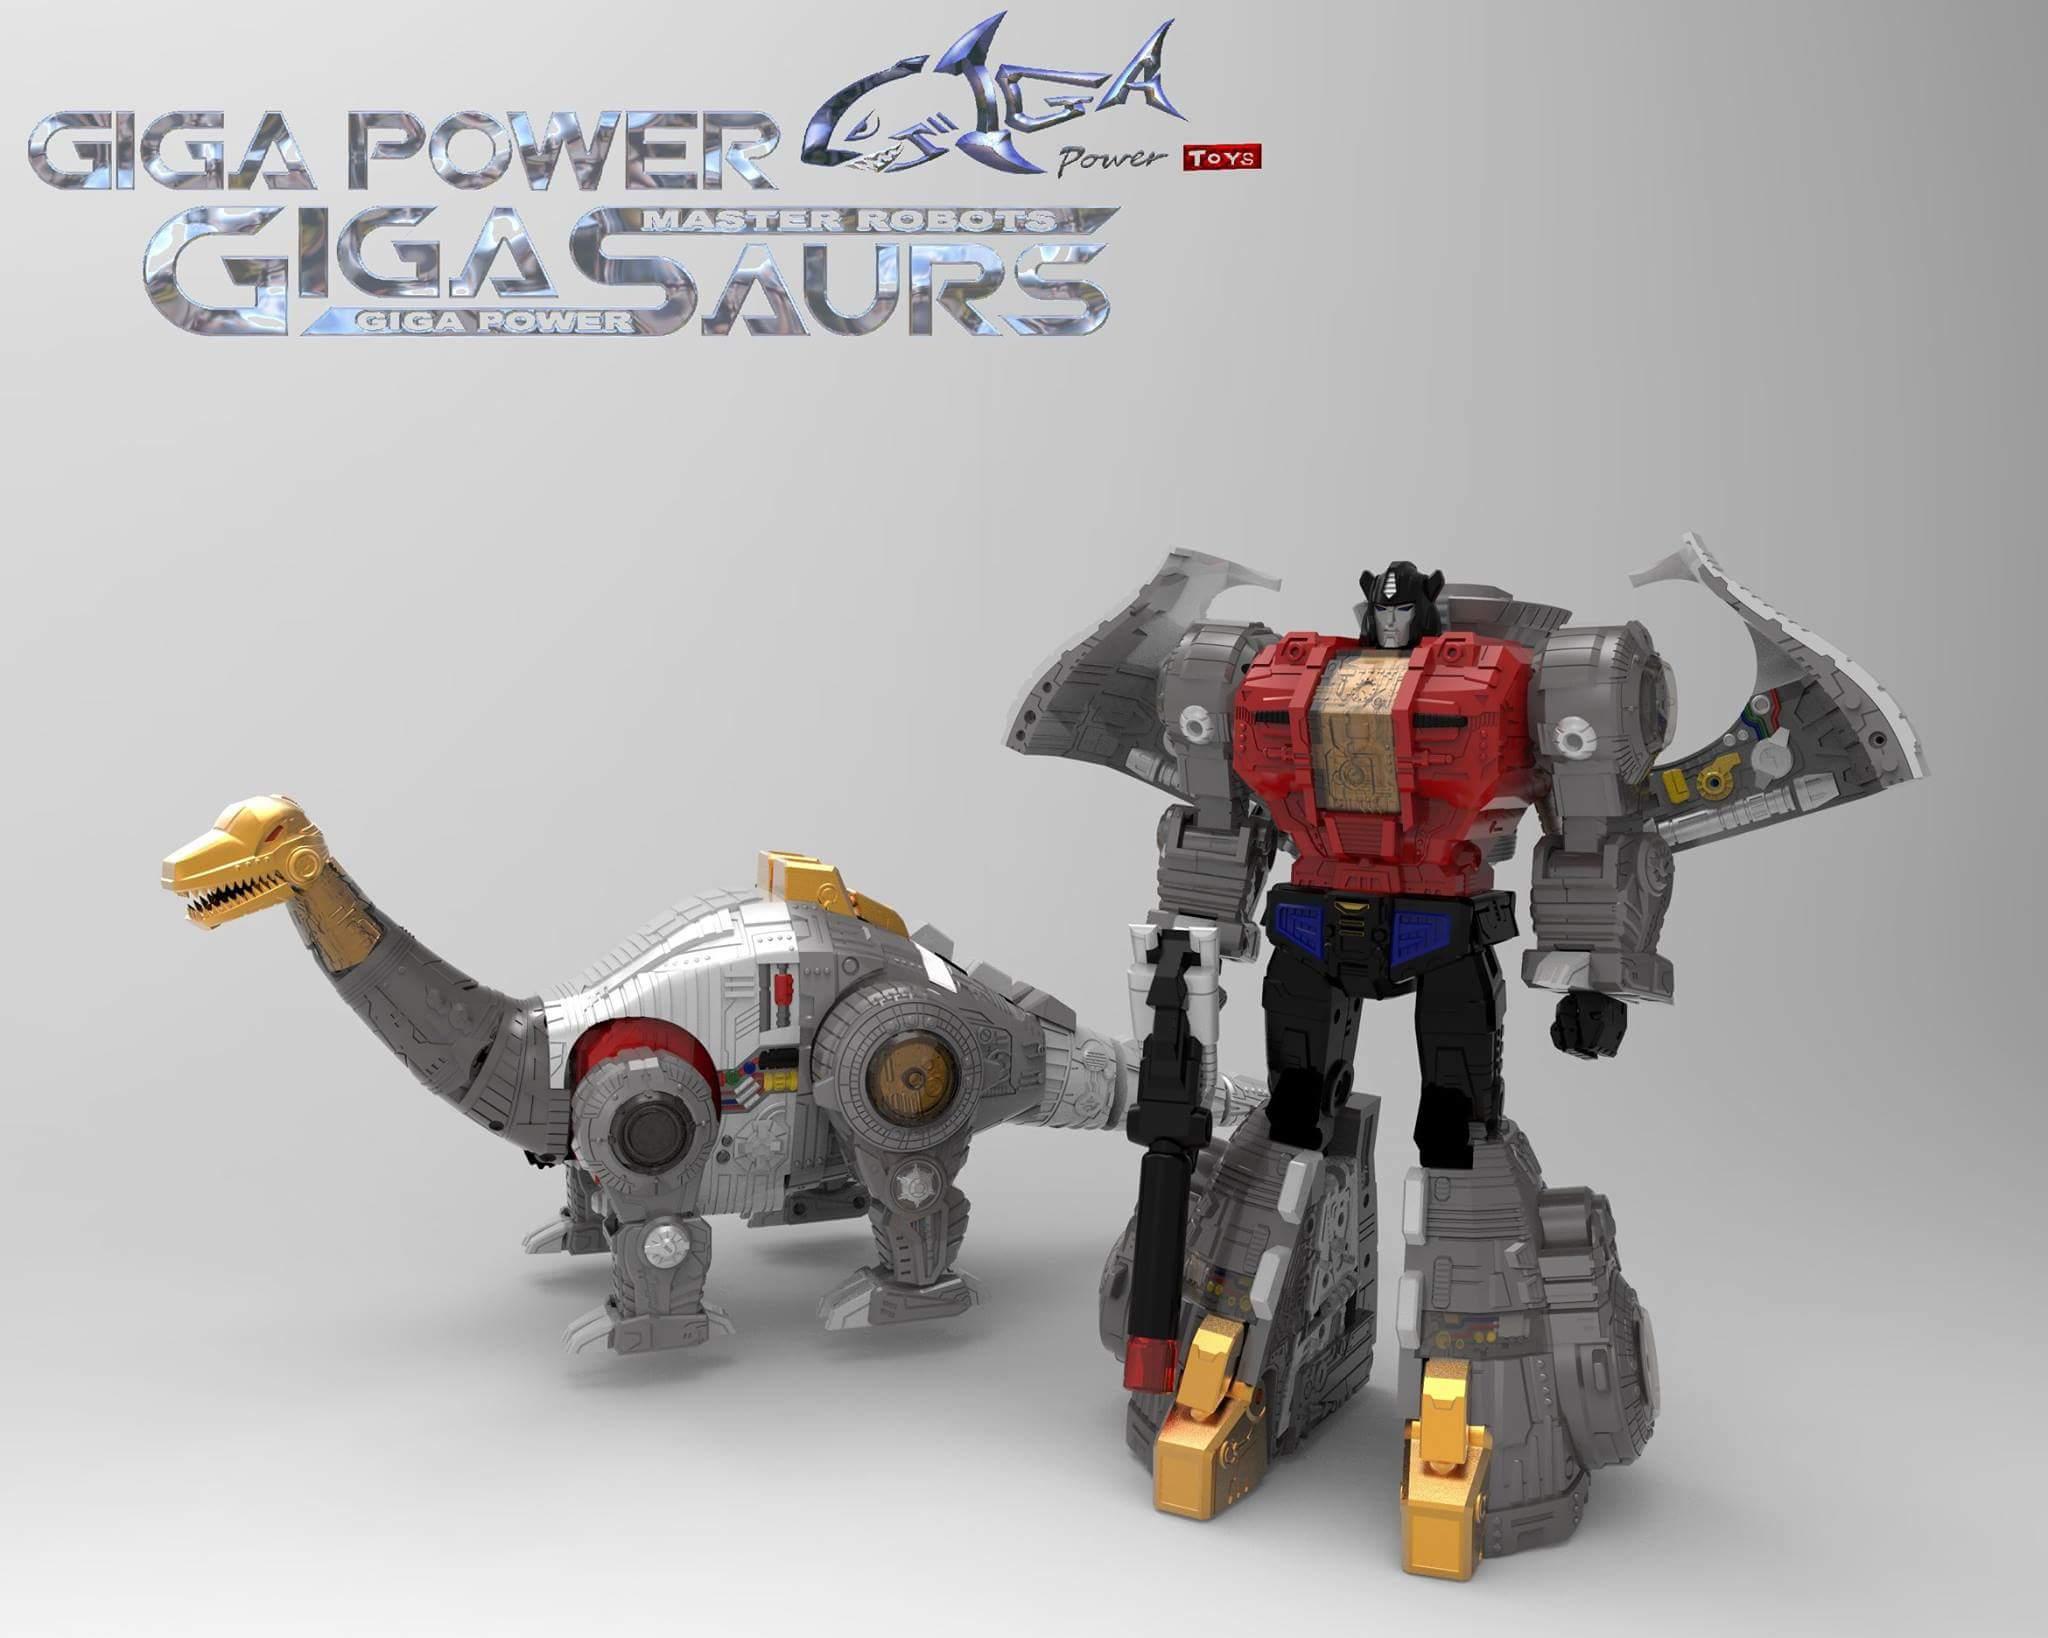 [GigaPower] Produit Tiers - Jouets HQ-01 Superator + HQ-02 Grassor + HQ-03 Guttur + HQ-04 Graviter + HQ-05 Gaudenter - aka Dinobots - Page 5 1S4uLjpH